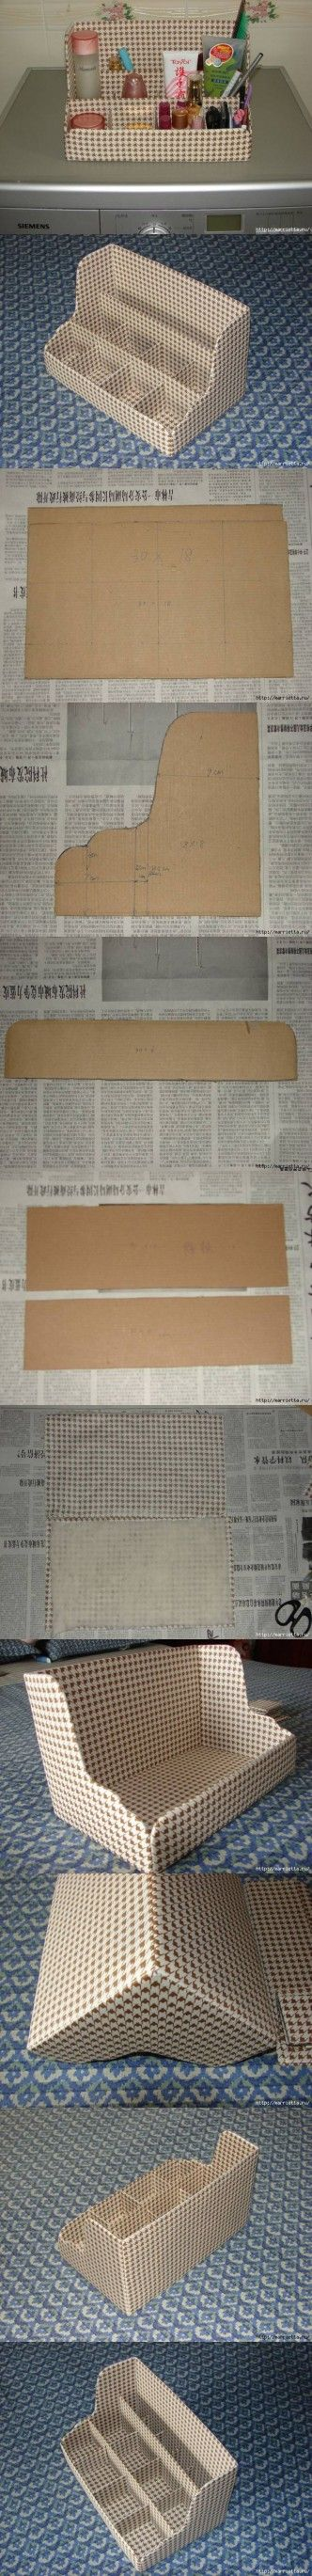 DIY Cardboard Shelves Organizer DIY Projects